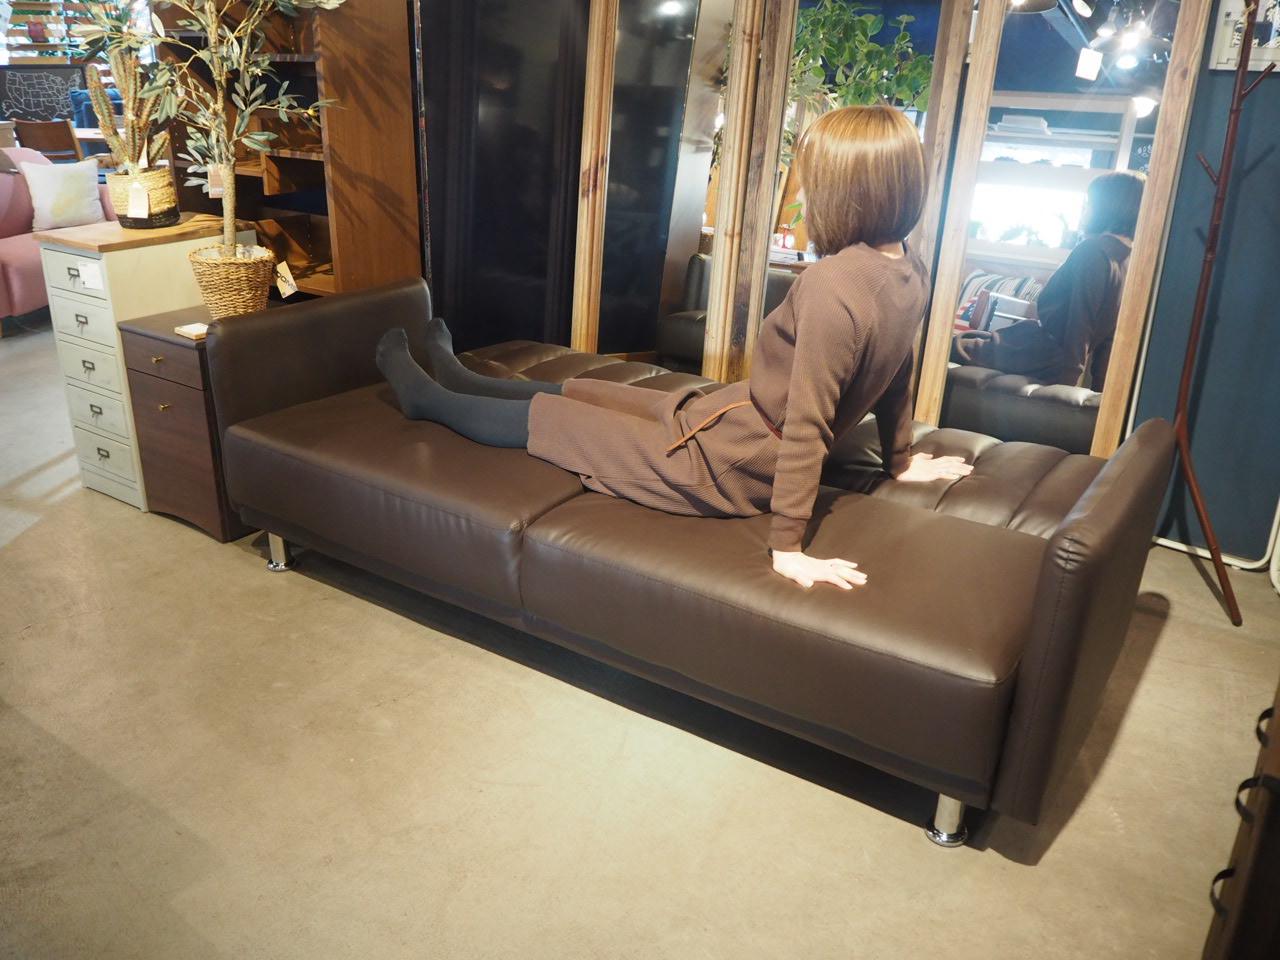 【BOOMS】個性派家具専門店ブームス